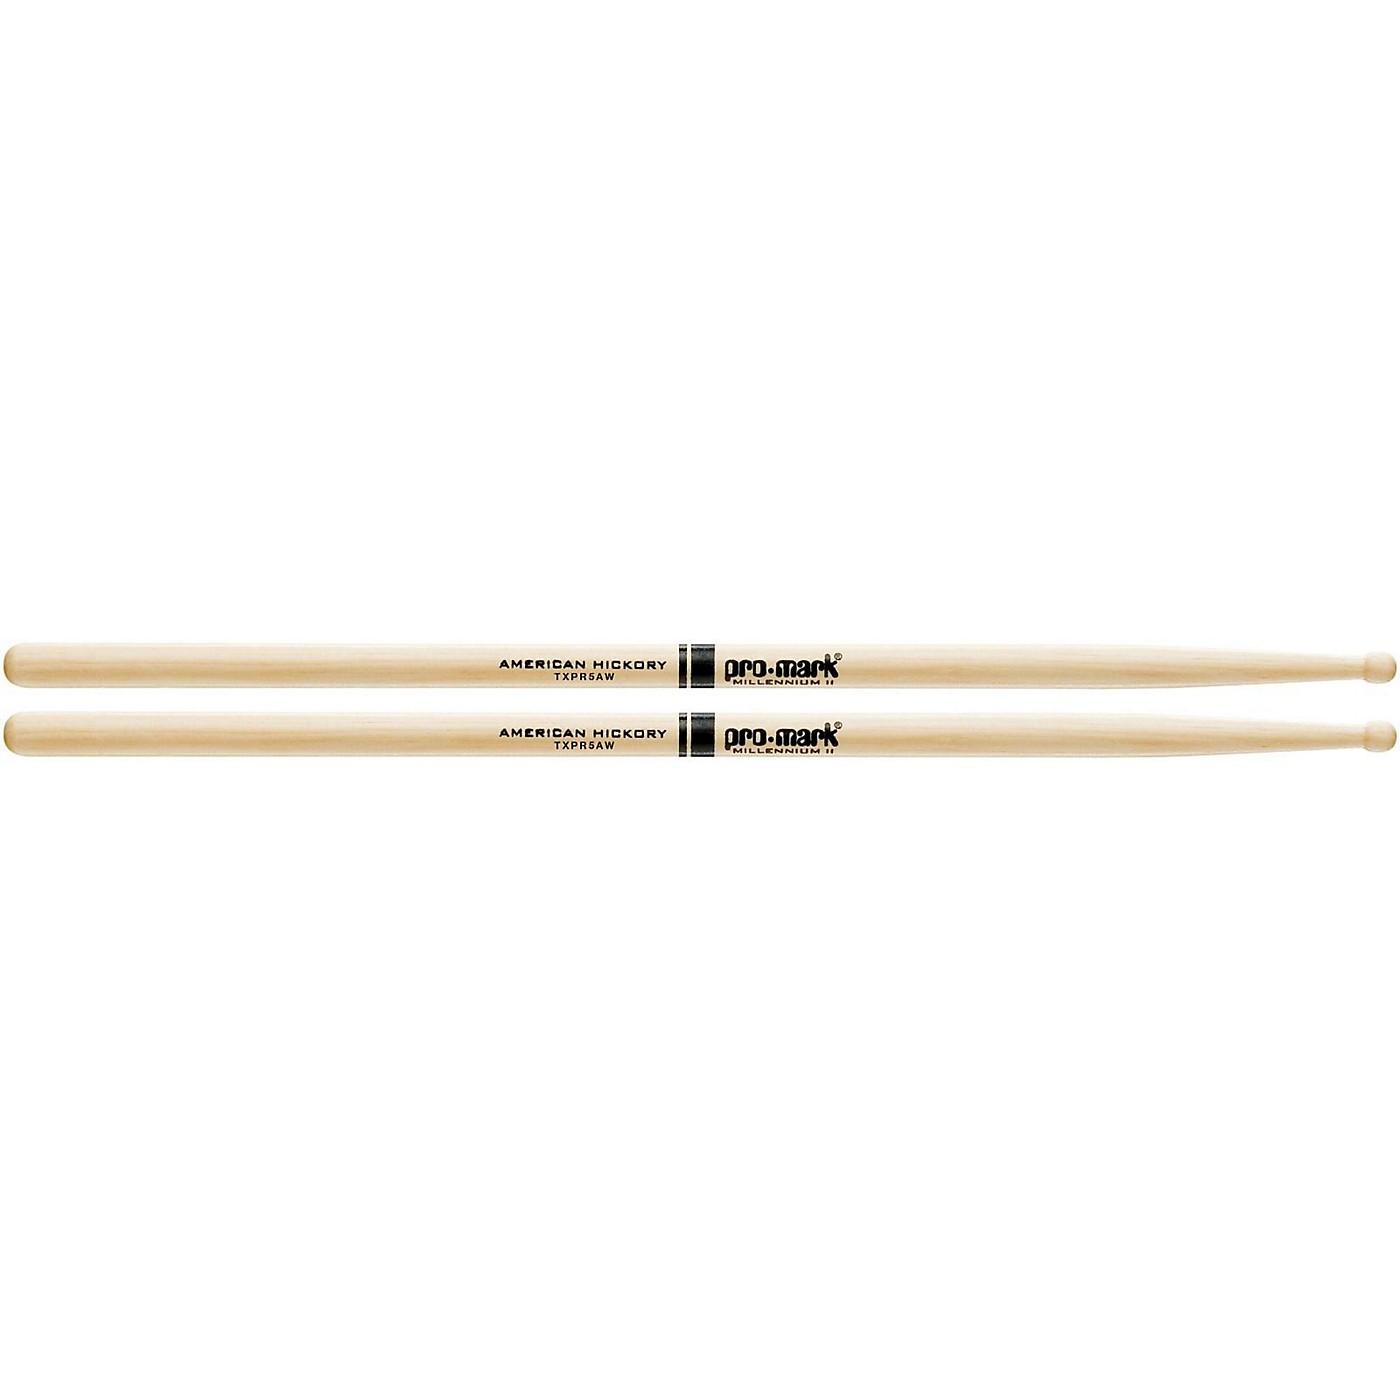 Promark Hickory 5A Pro-Round Wood Drum Sticks thumbnail